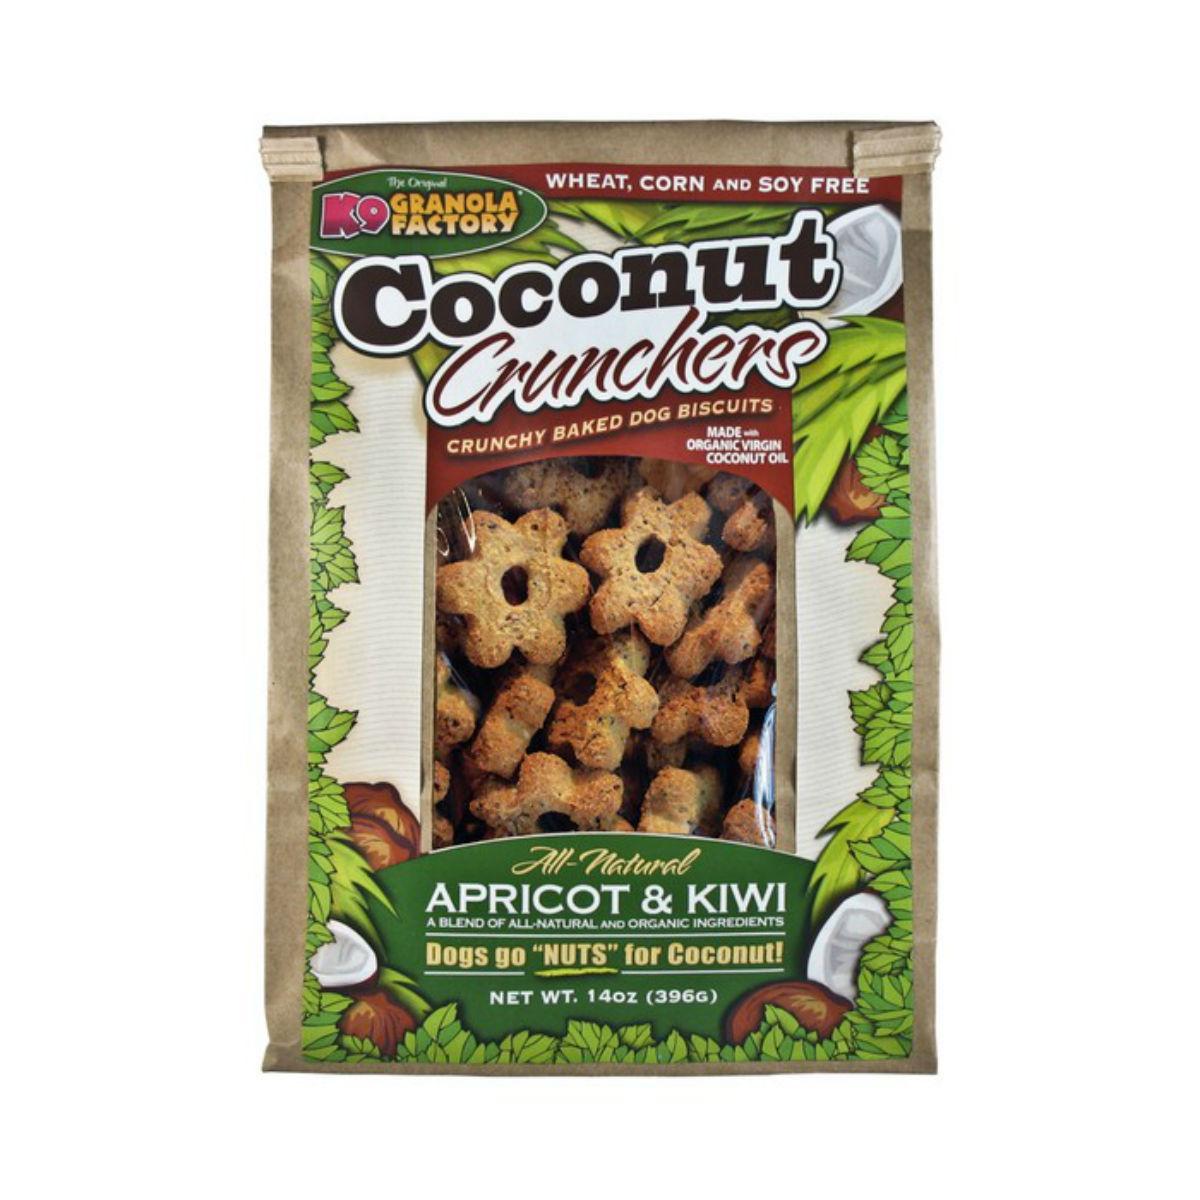 K9 Granola Factory Coconut Crunchers Dog Treat - Apricot & Kiwi